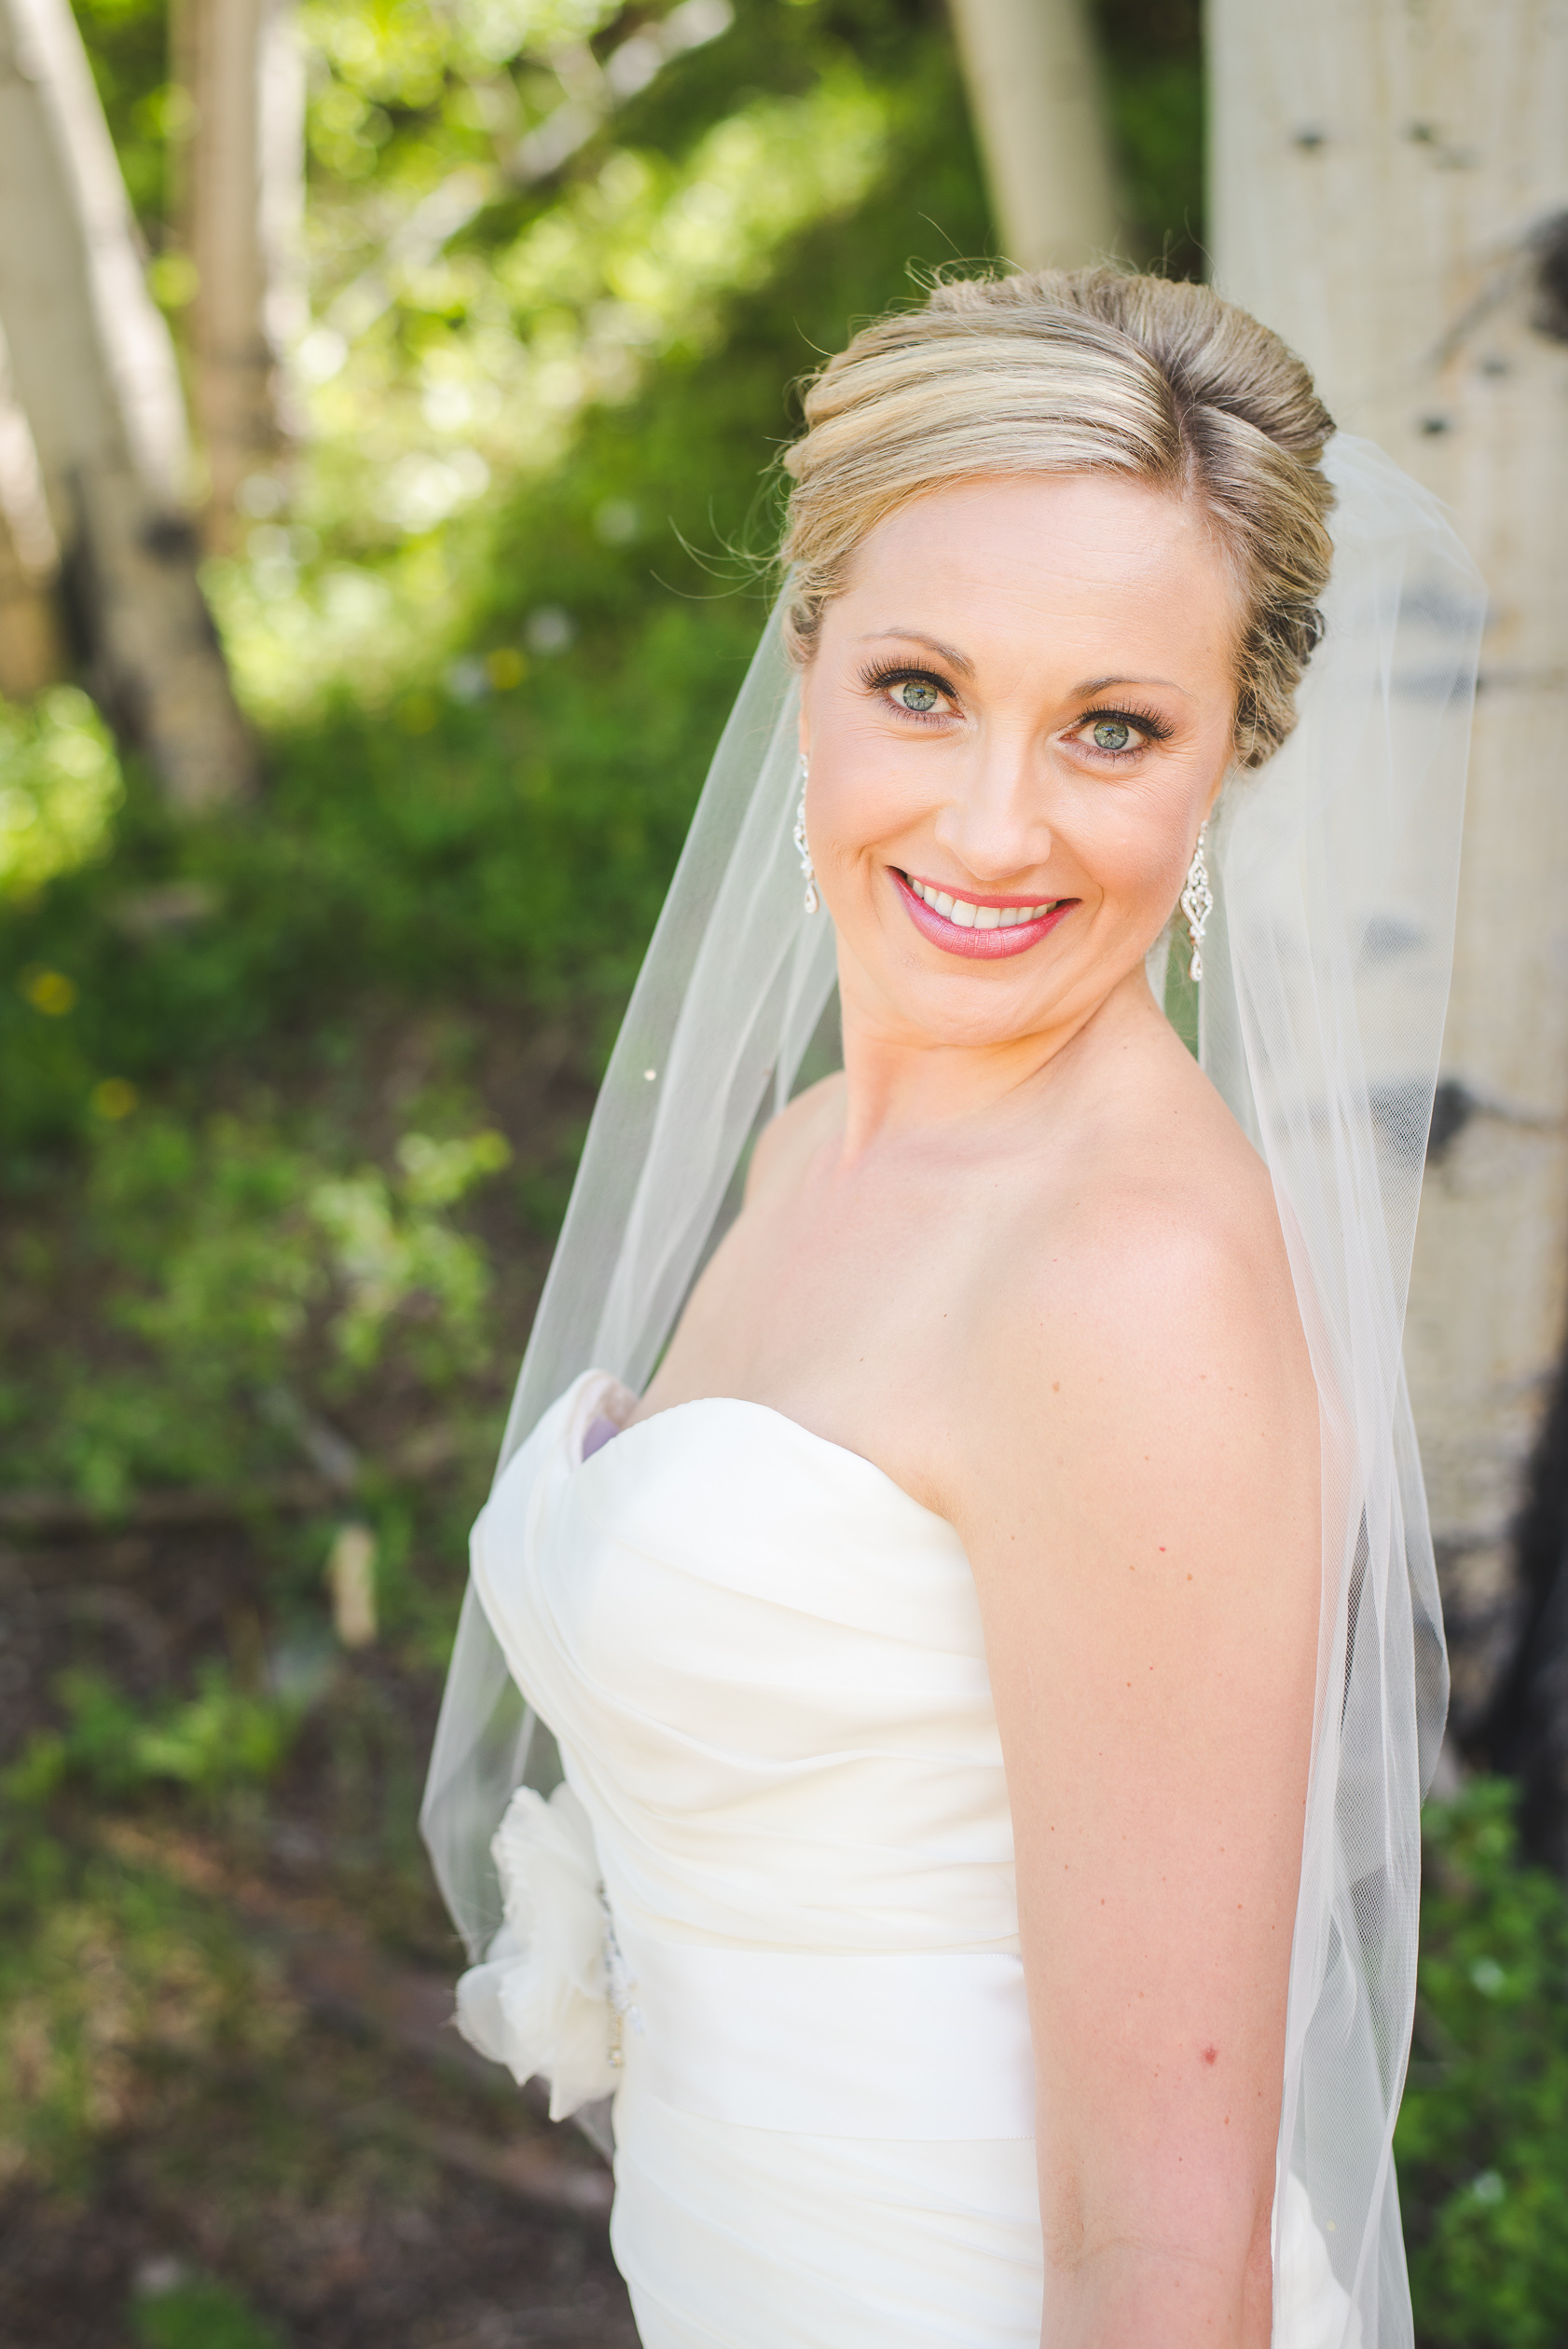 Bridal Portrait |Summit Mountain Weddings Intimate Wedding | Breckenridge, Colorado elopement photographer